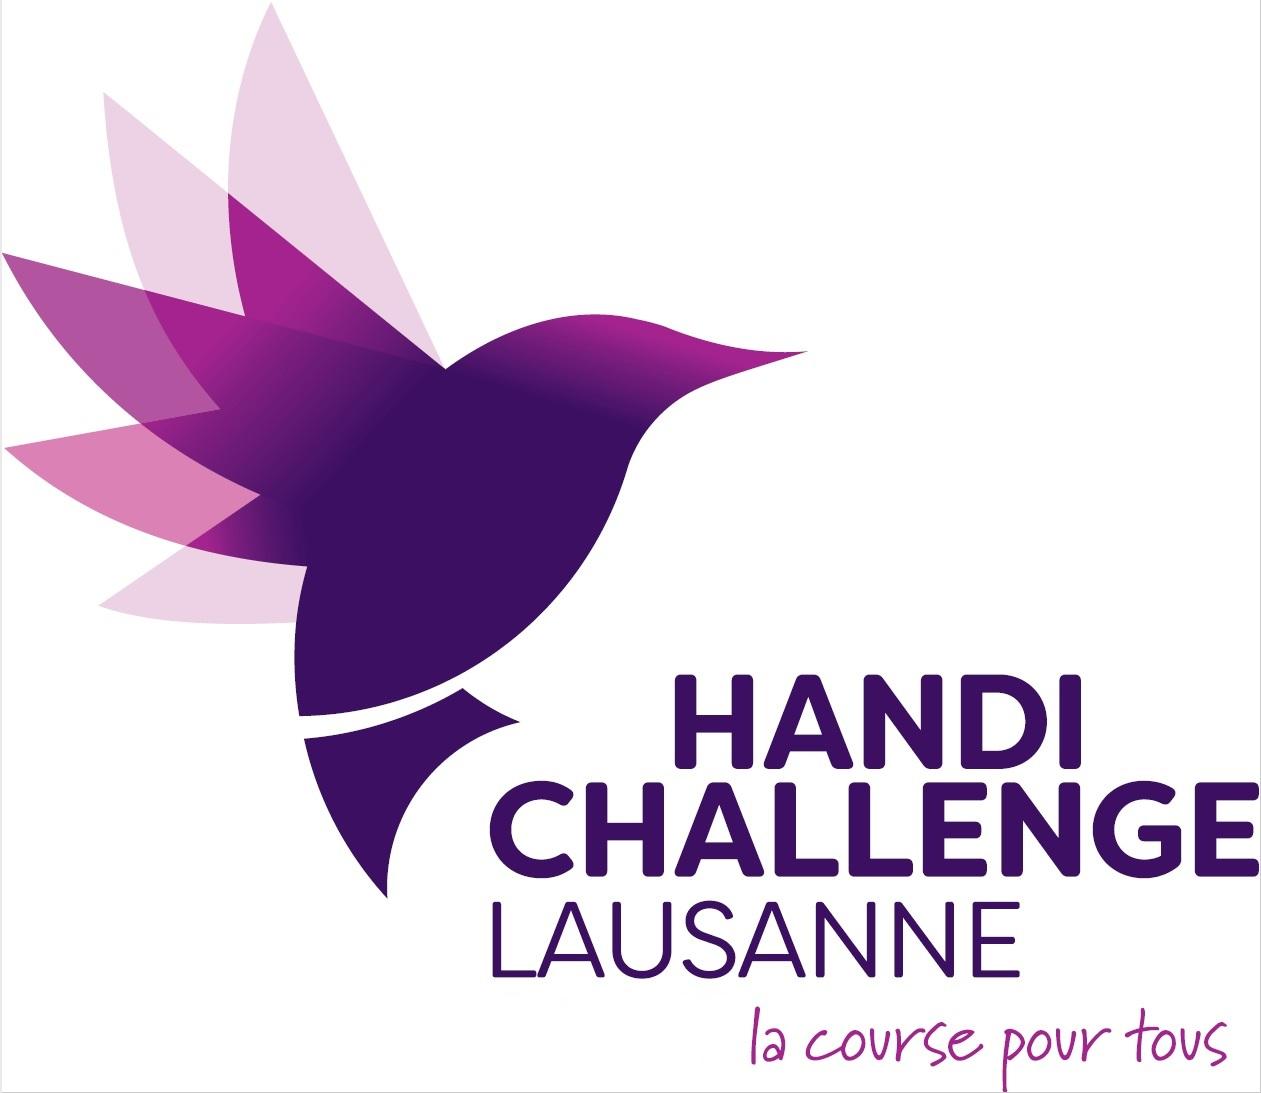 Handi-Challenge